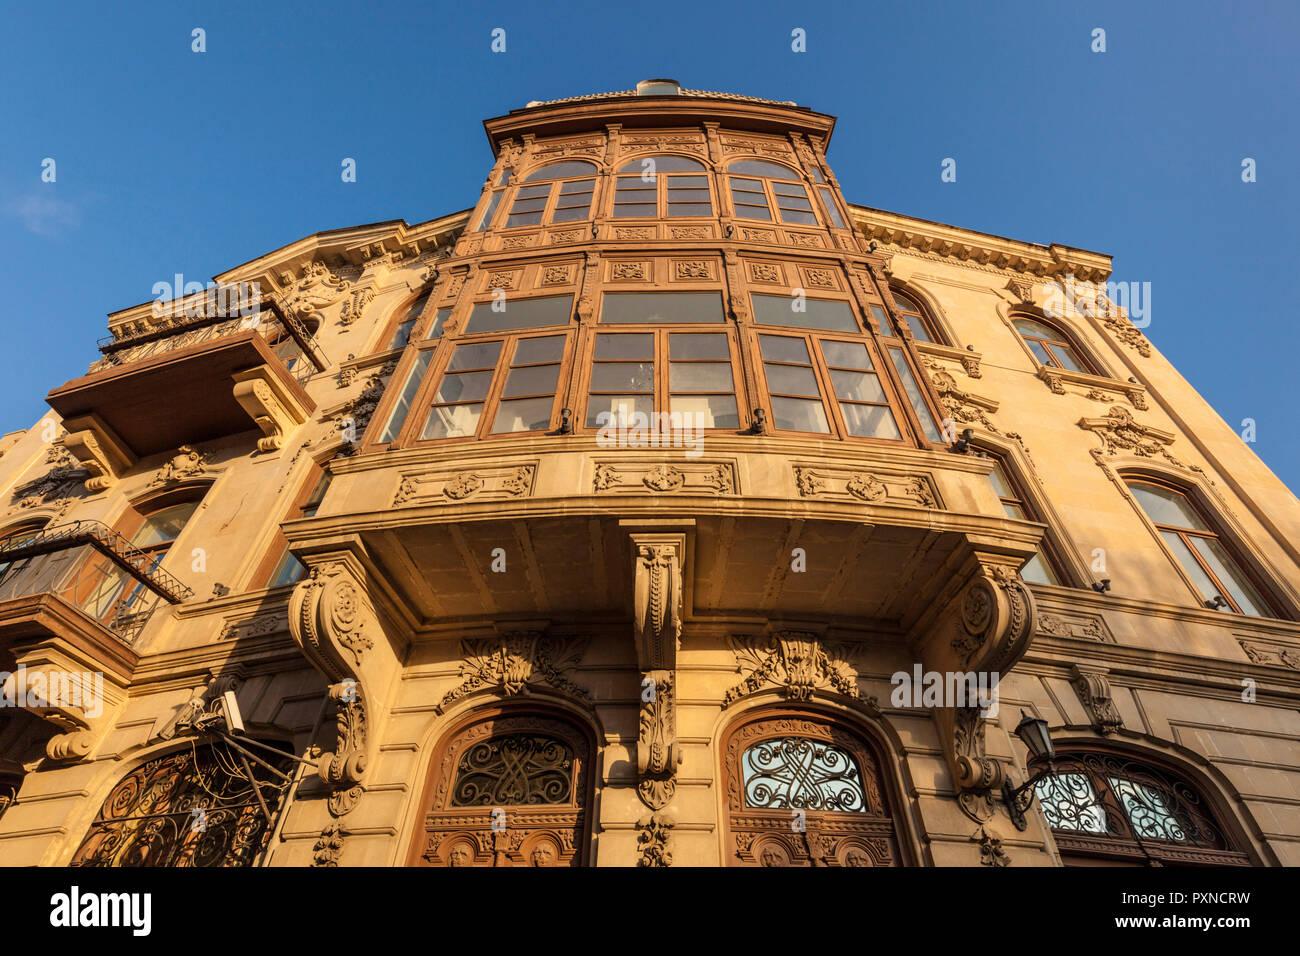 Azerbaijan, Baku, Old City, traditional architecture - Stock Image